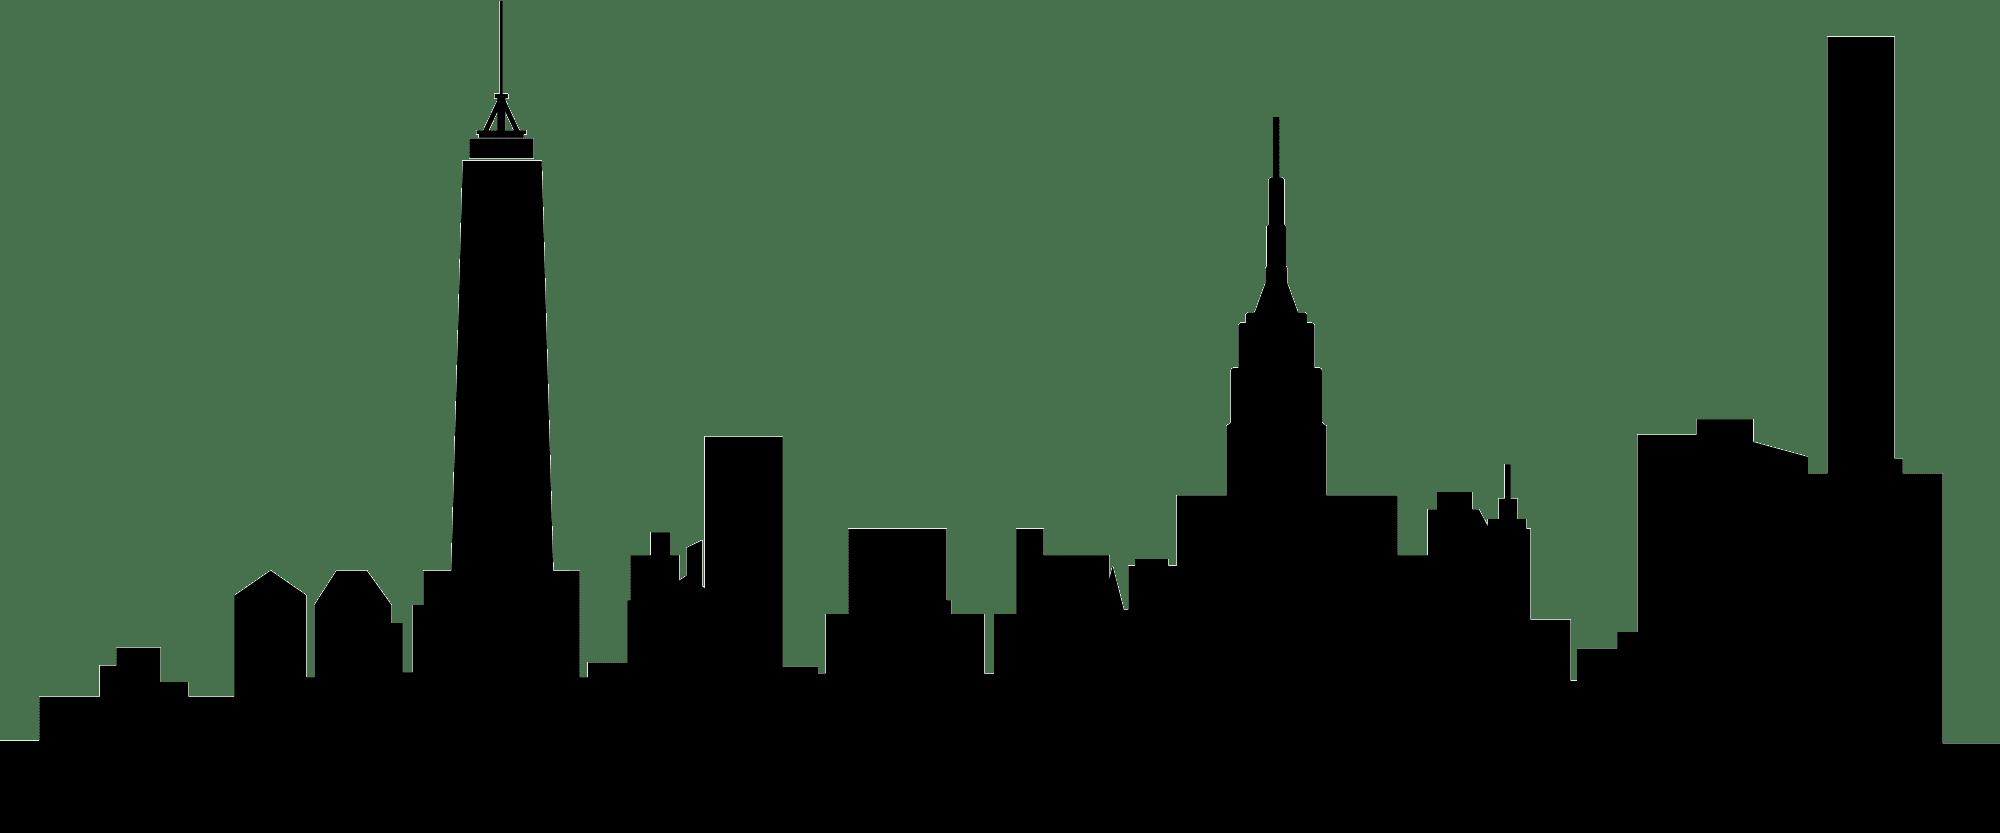 Silhouette Spiderman at GetDrawings | Free download